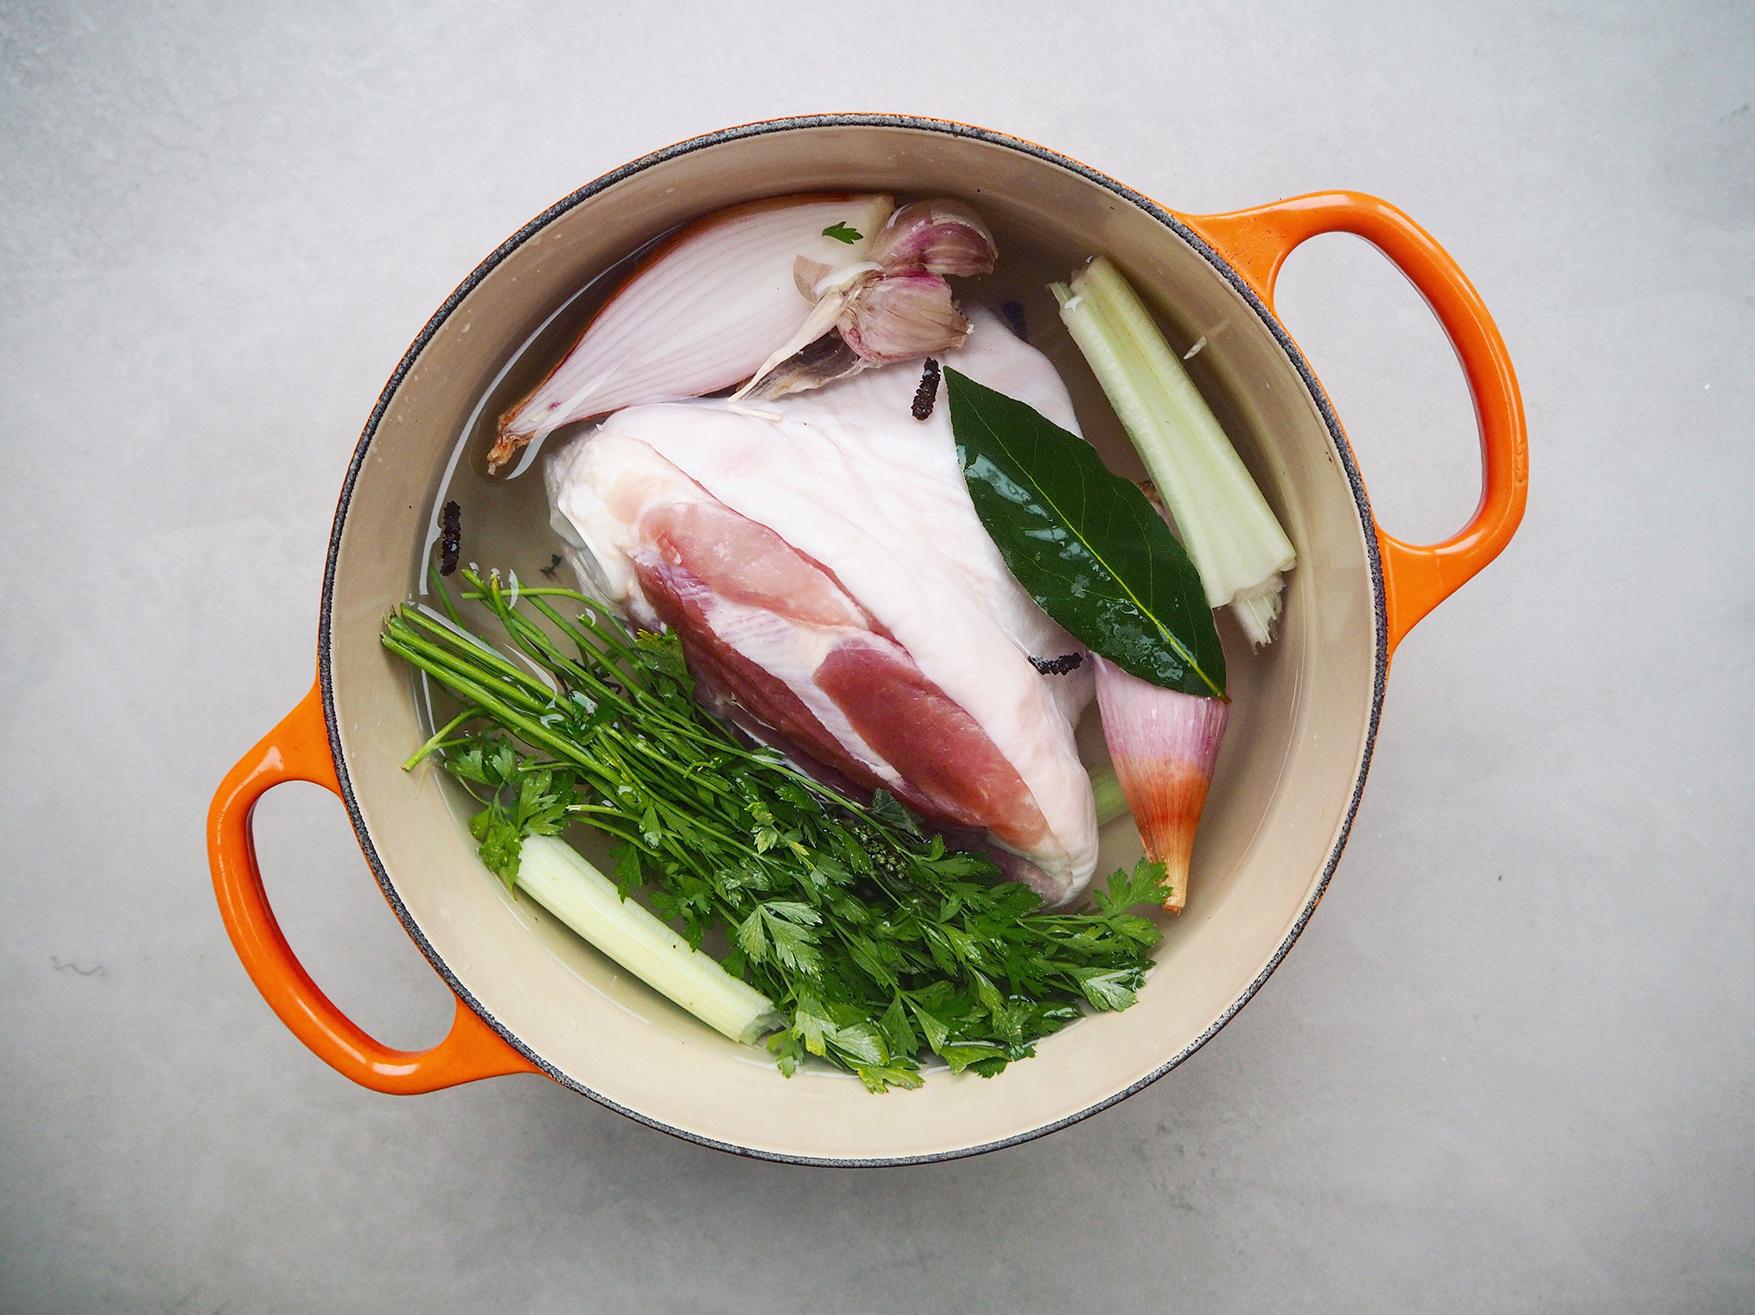 Cooking a Ham to Make Ham Hock